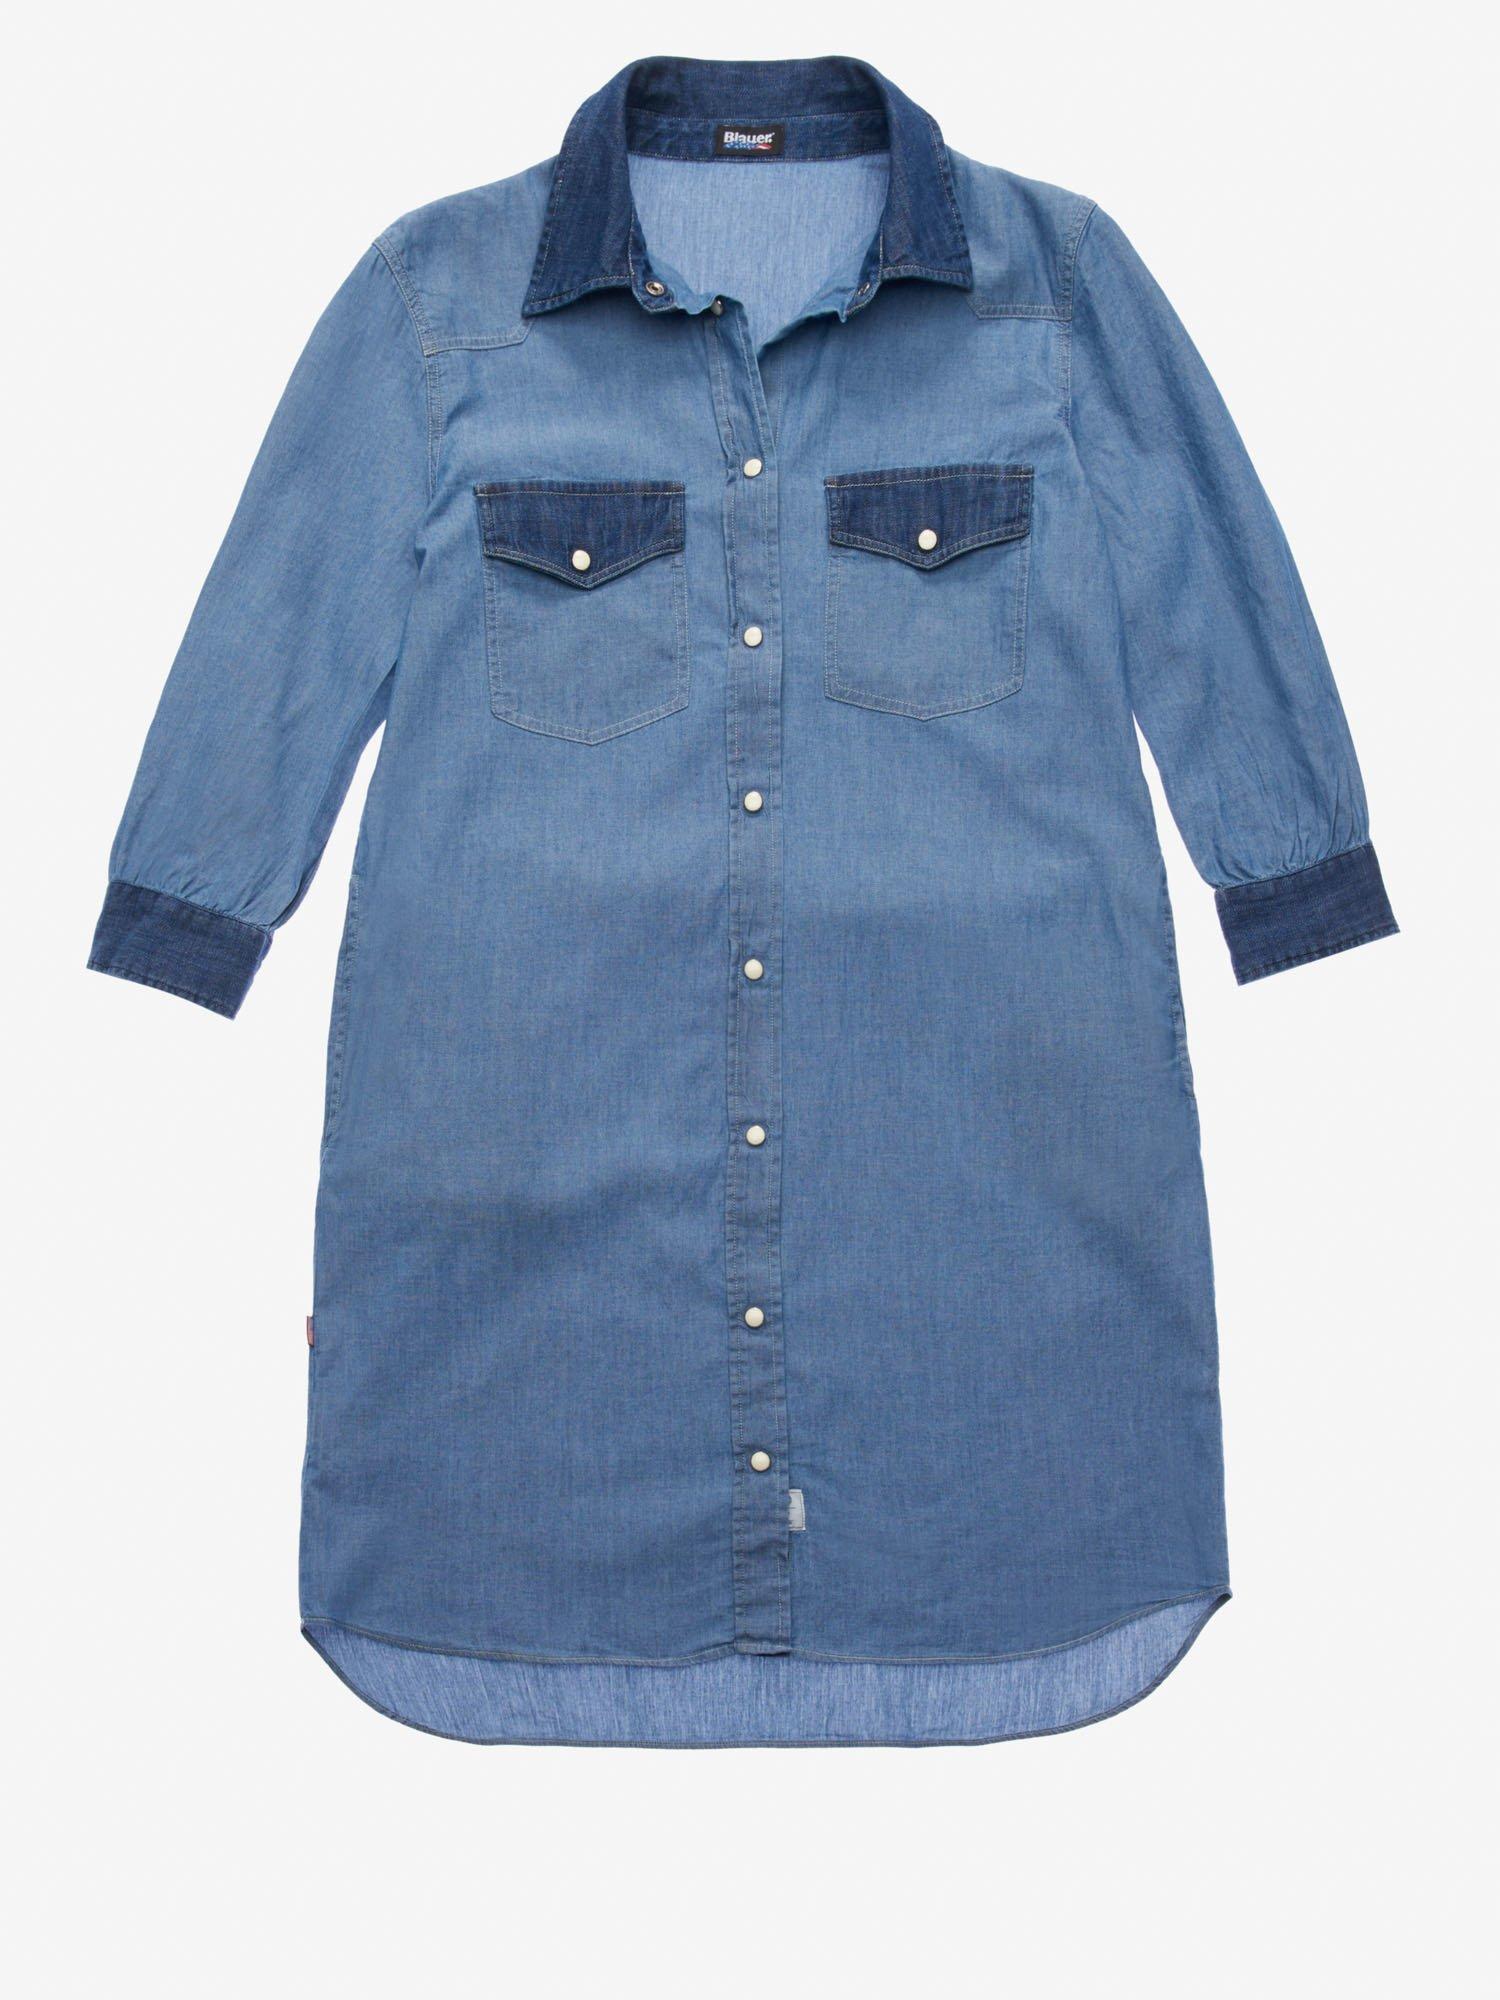 CHAMBRAY AND DENIM DRESS - Blauer